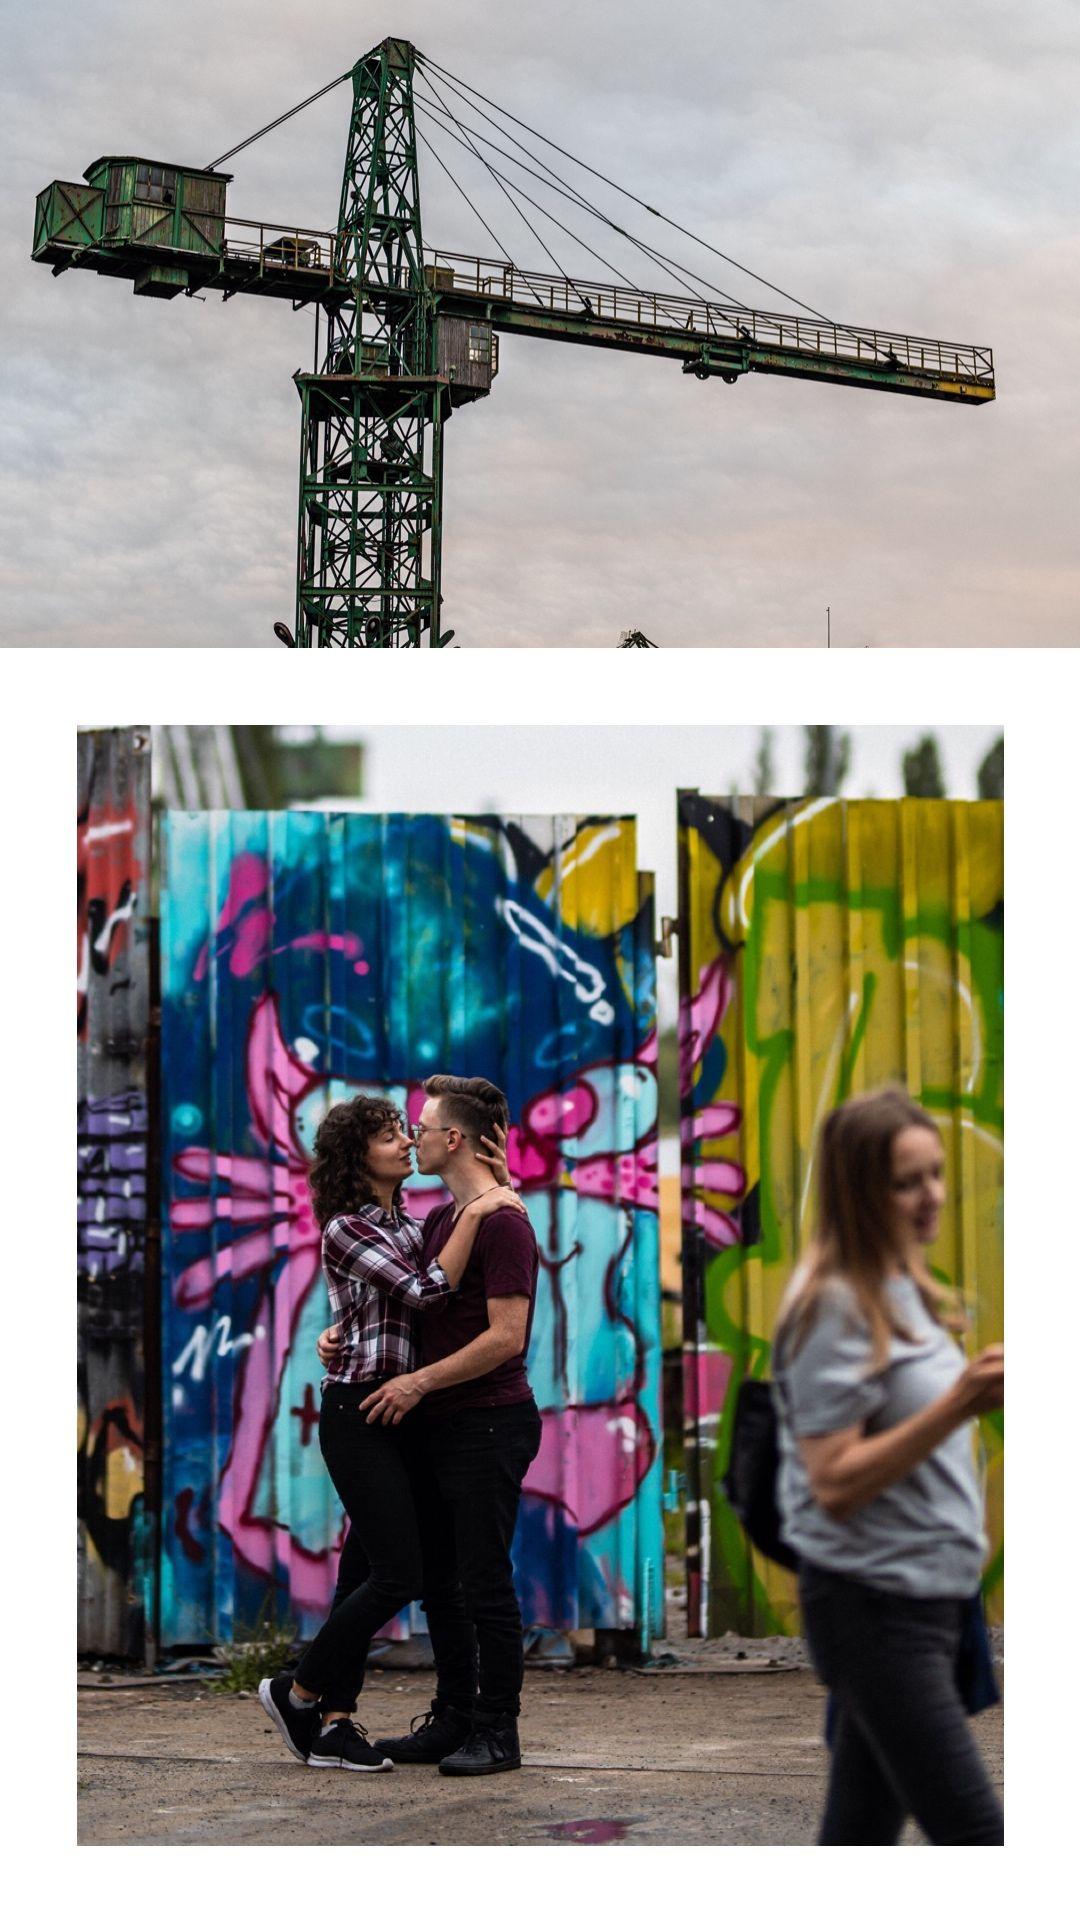 sesja narzeczeńska, sesja narzeczeńska Stocznia Gdańsk, industrialna sesja narzeczeńska, sesja w stoczni, elektryków Gdańsk, Sesja Stocznia Cesarska